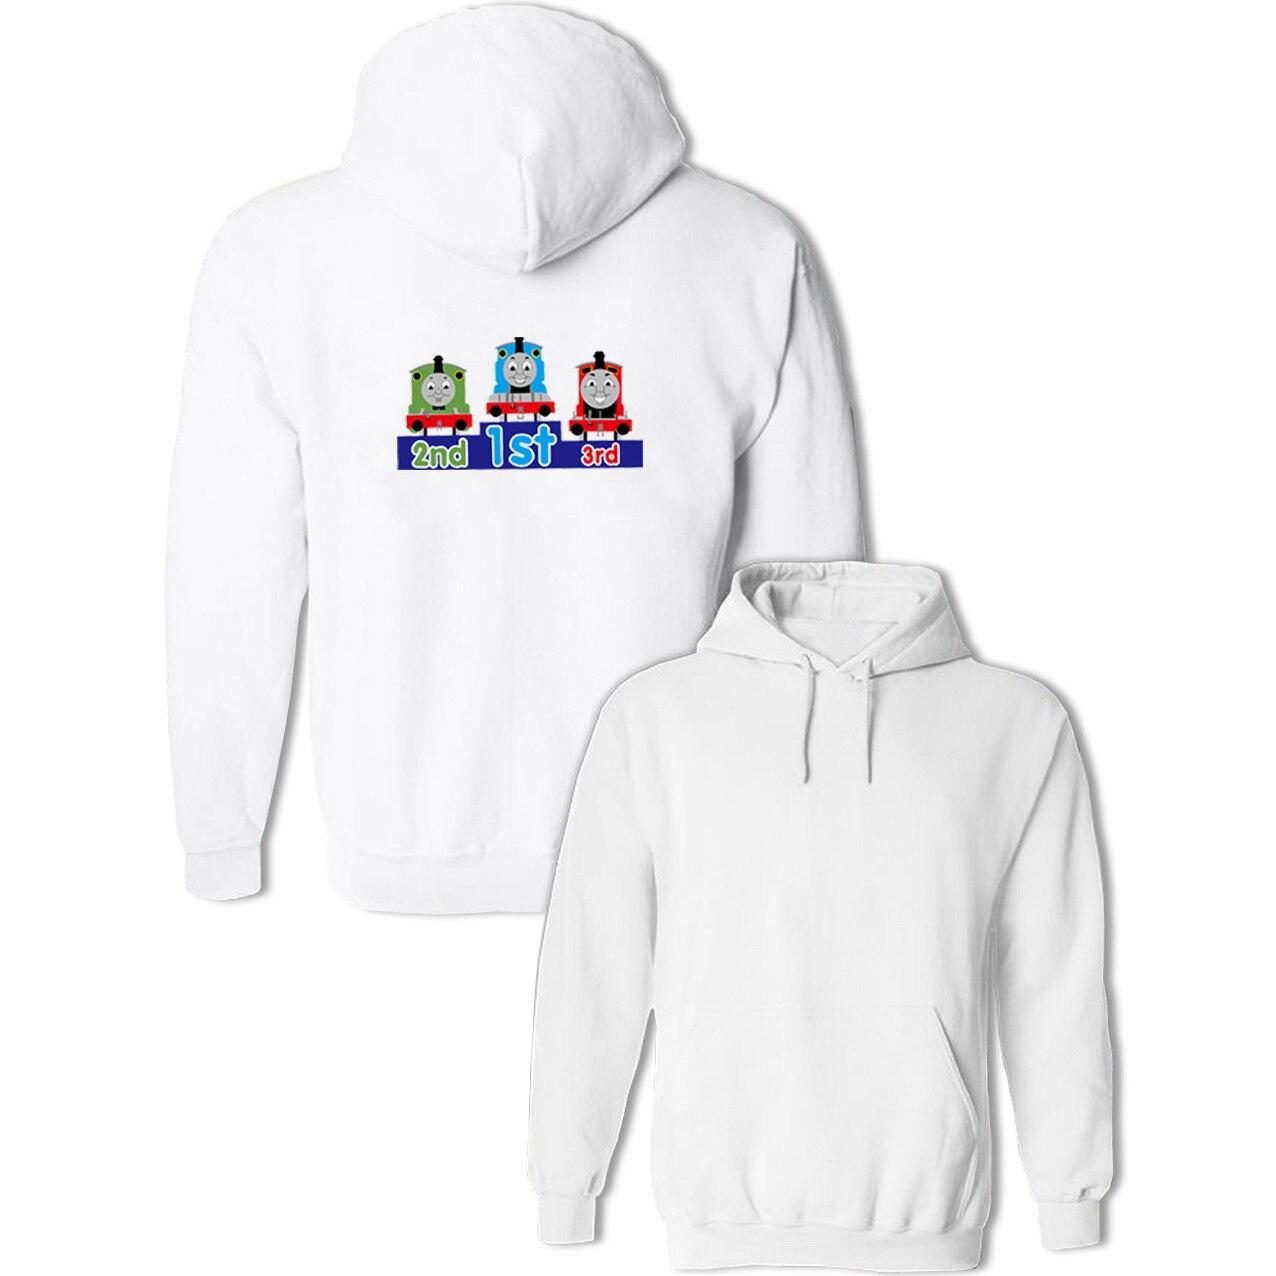 Thomas And His Friends Funny Cartoon Hoodie Men's Women's Girls Boys Sweatshirt Spring Autumn Jackets Hip Hop Cotton Streetwear